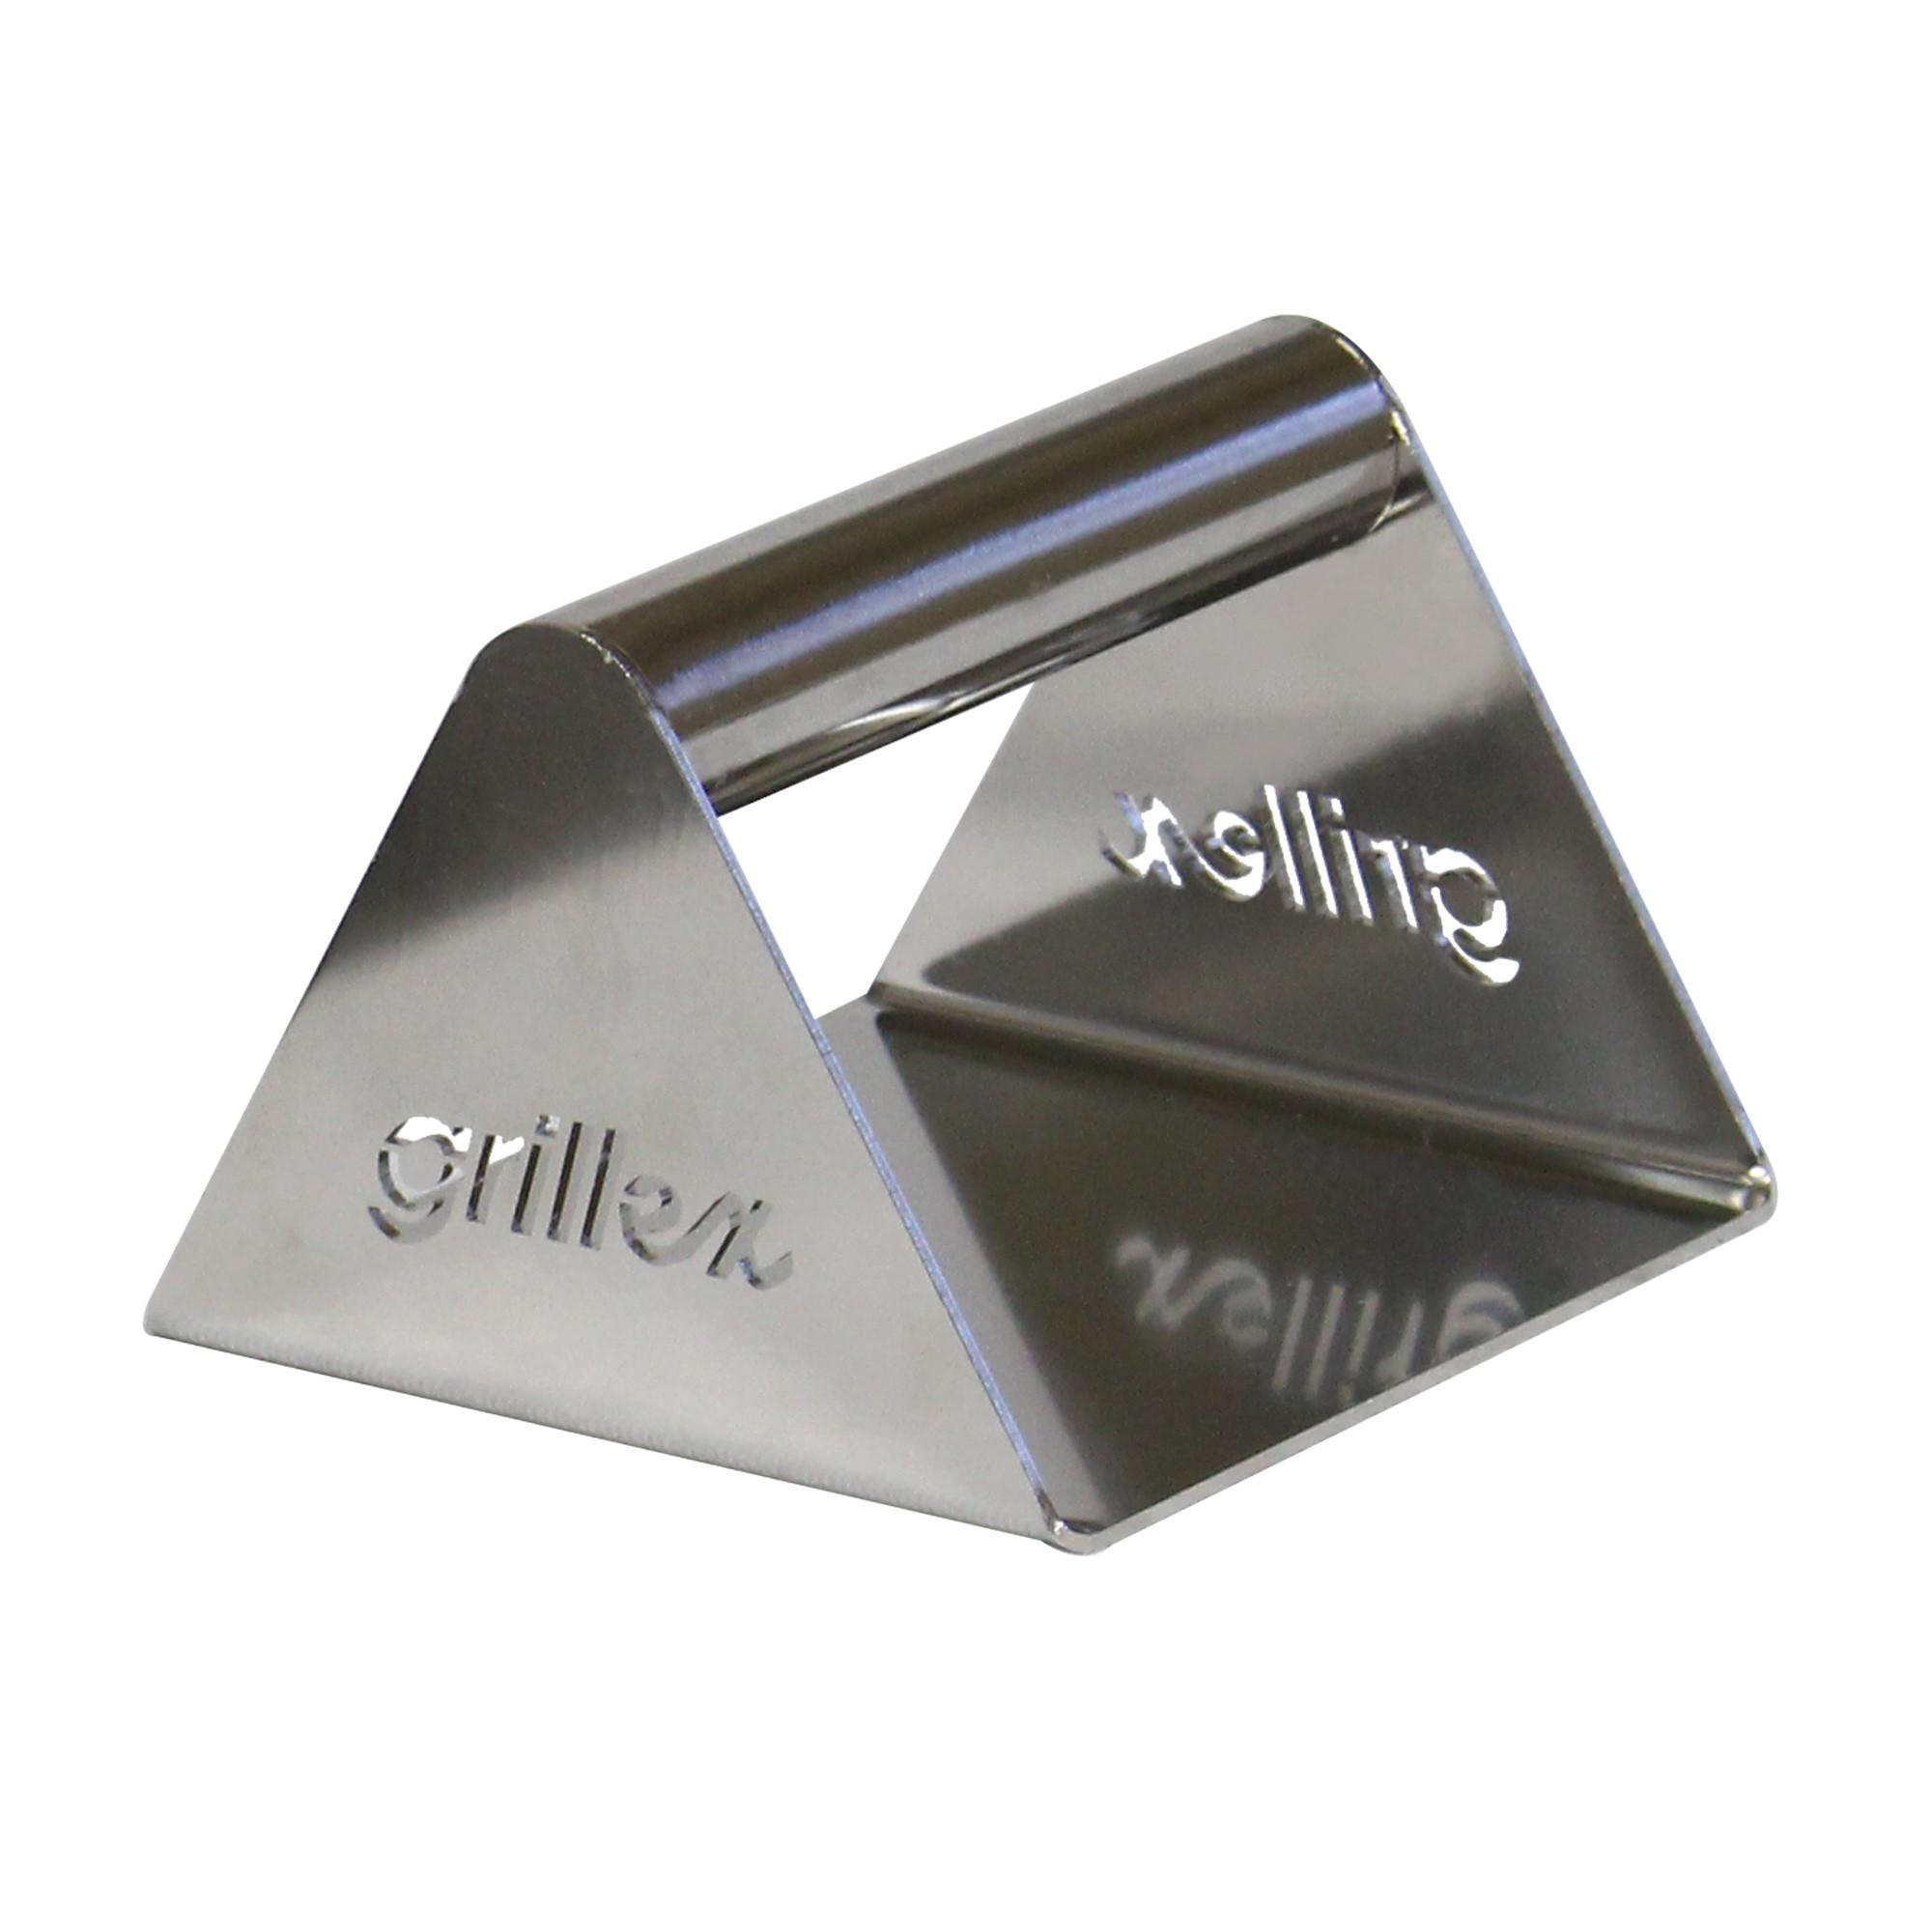 Espátula Grillex Smash Inox 304